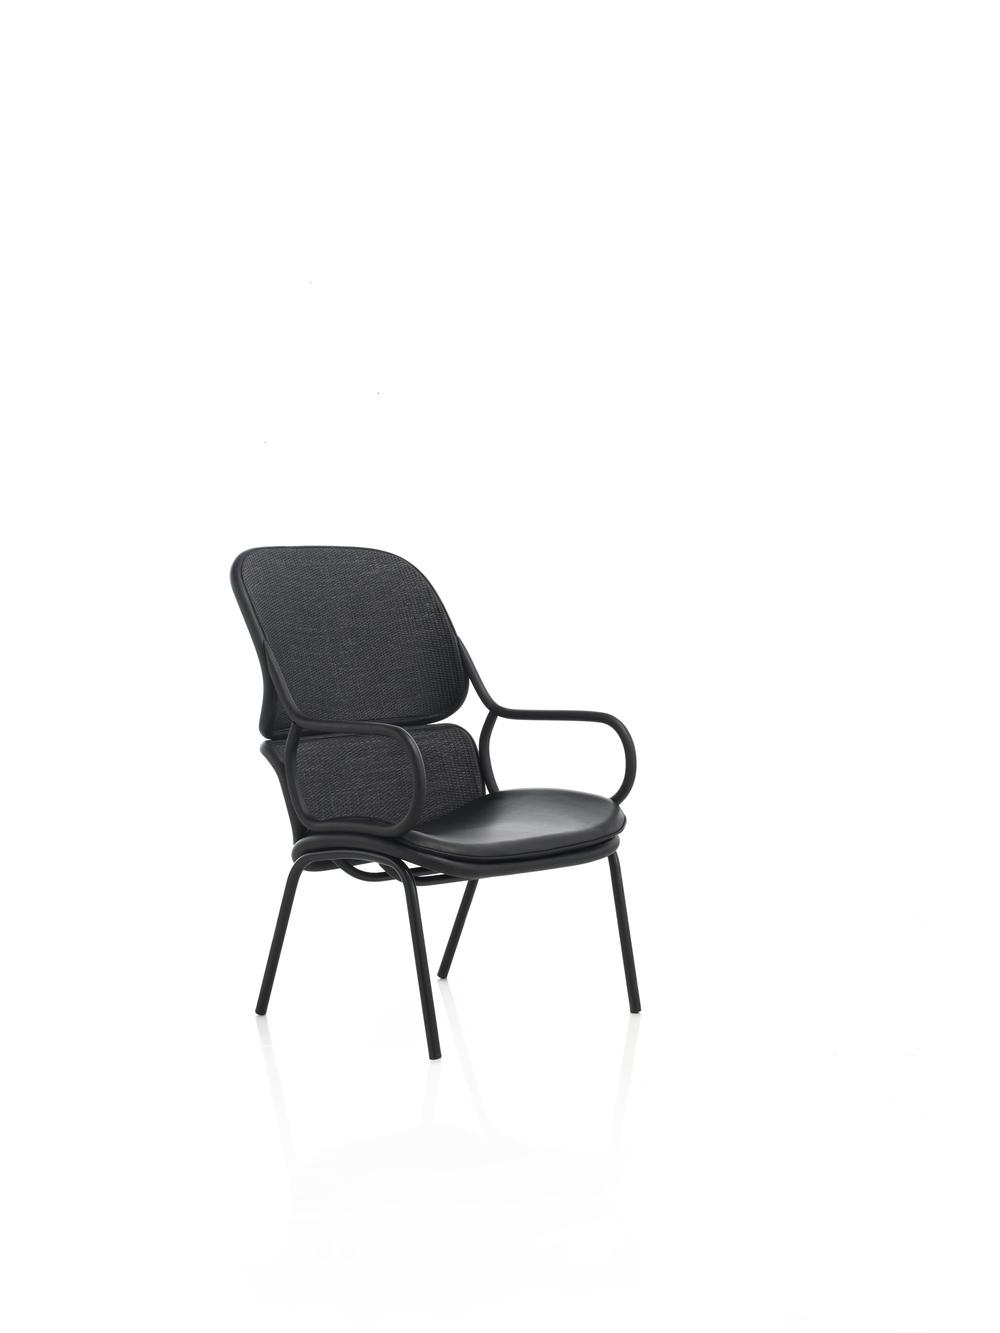 Hayon's 'Frames' armchair for Expormim.